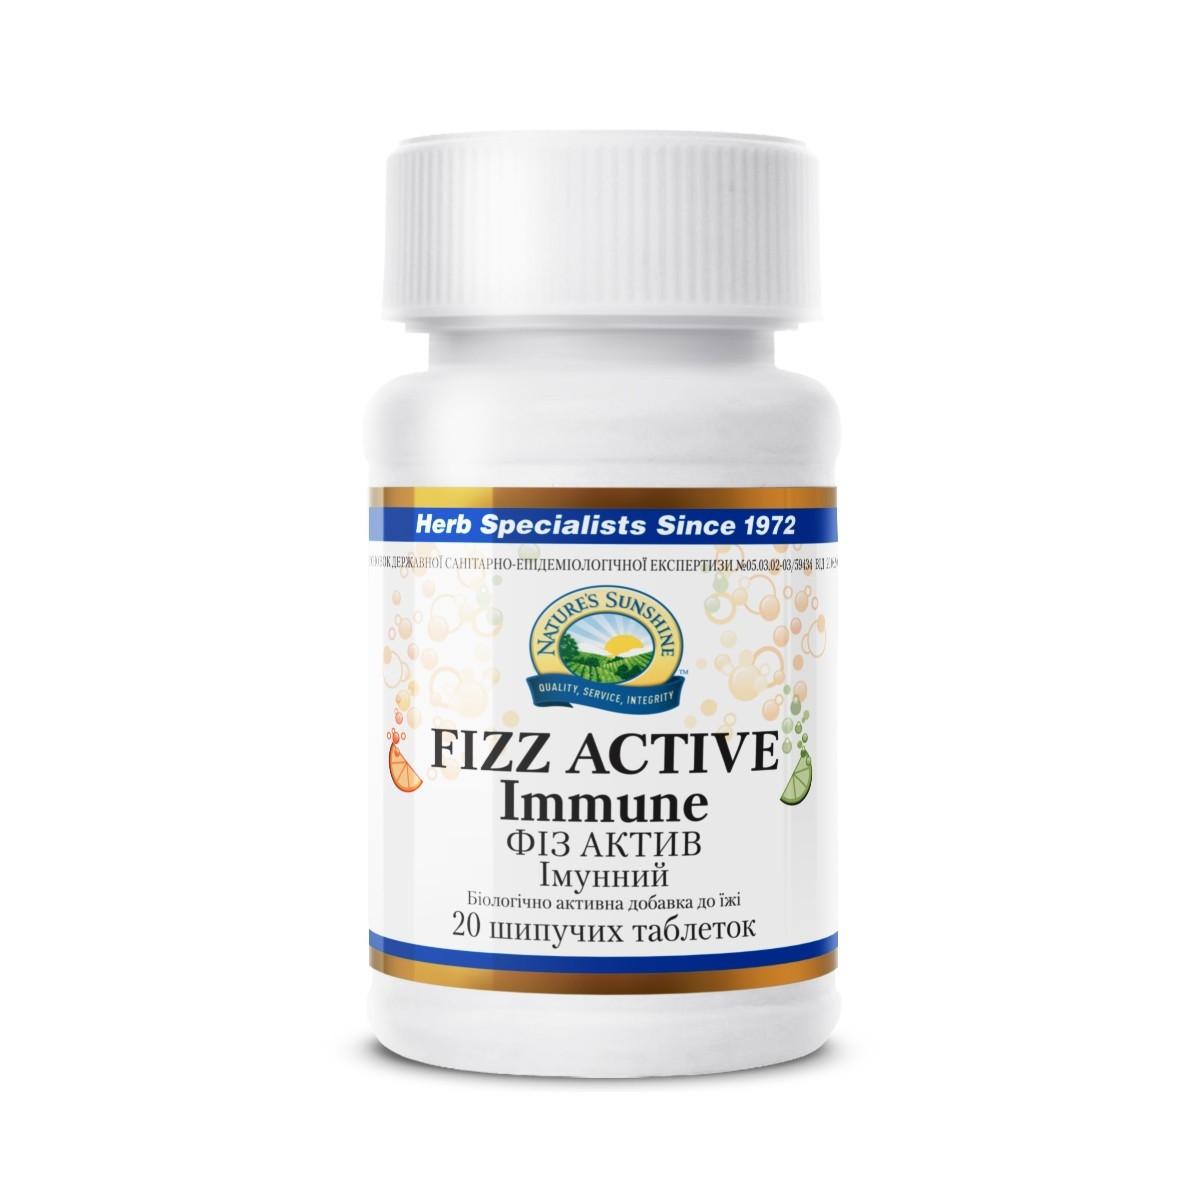 Fizz Active Immune Физ Актив иммунной, NSP, США